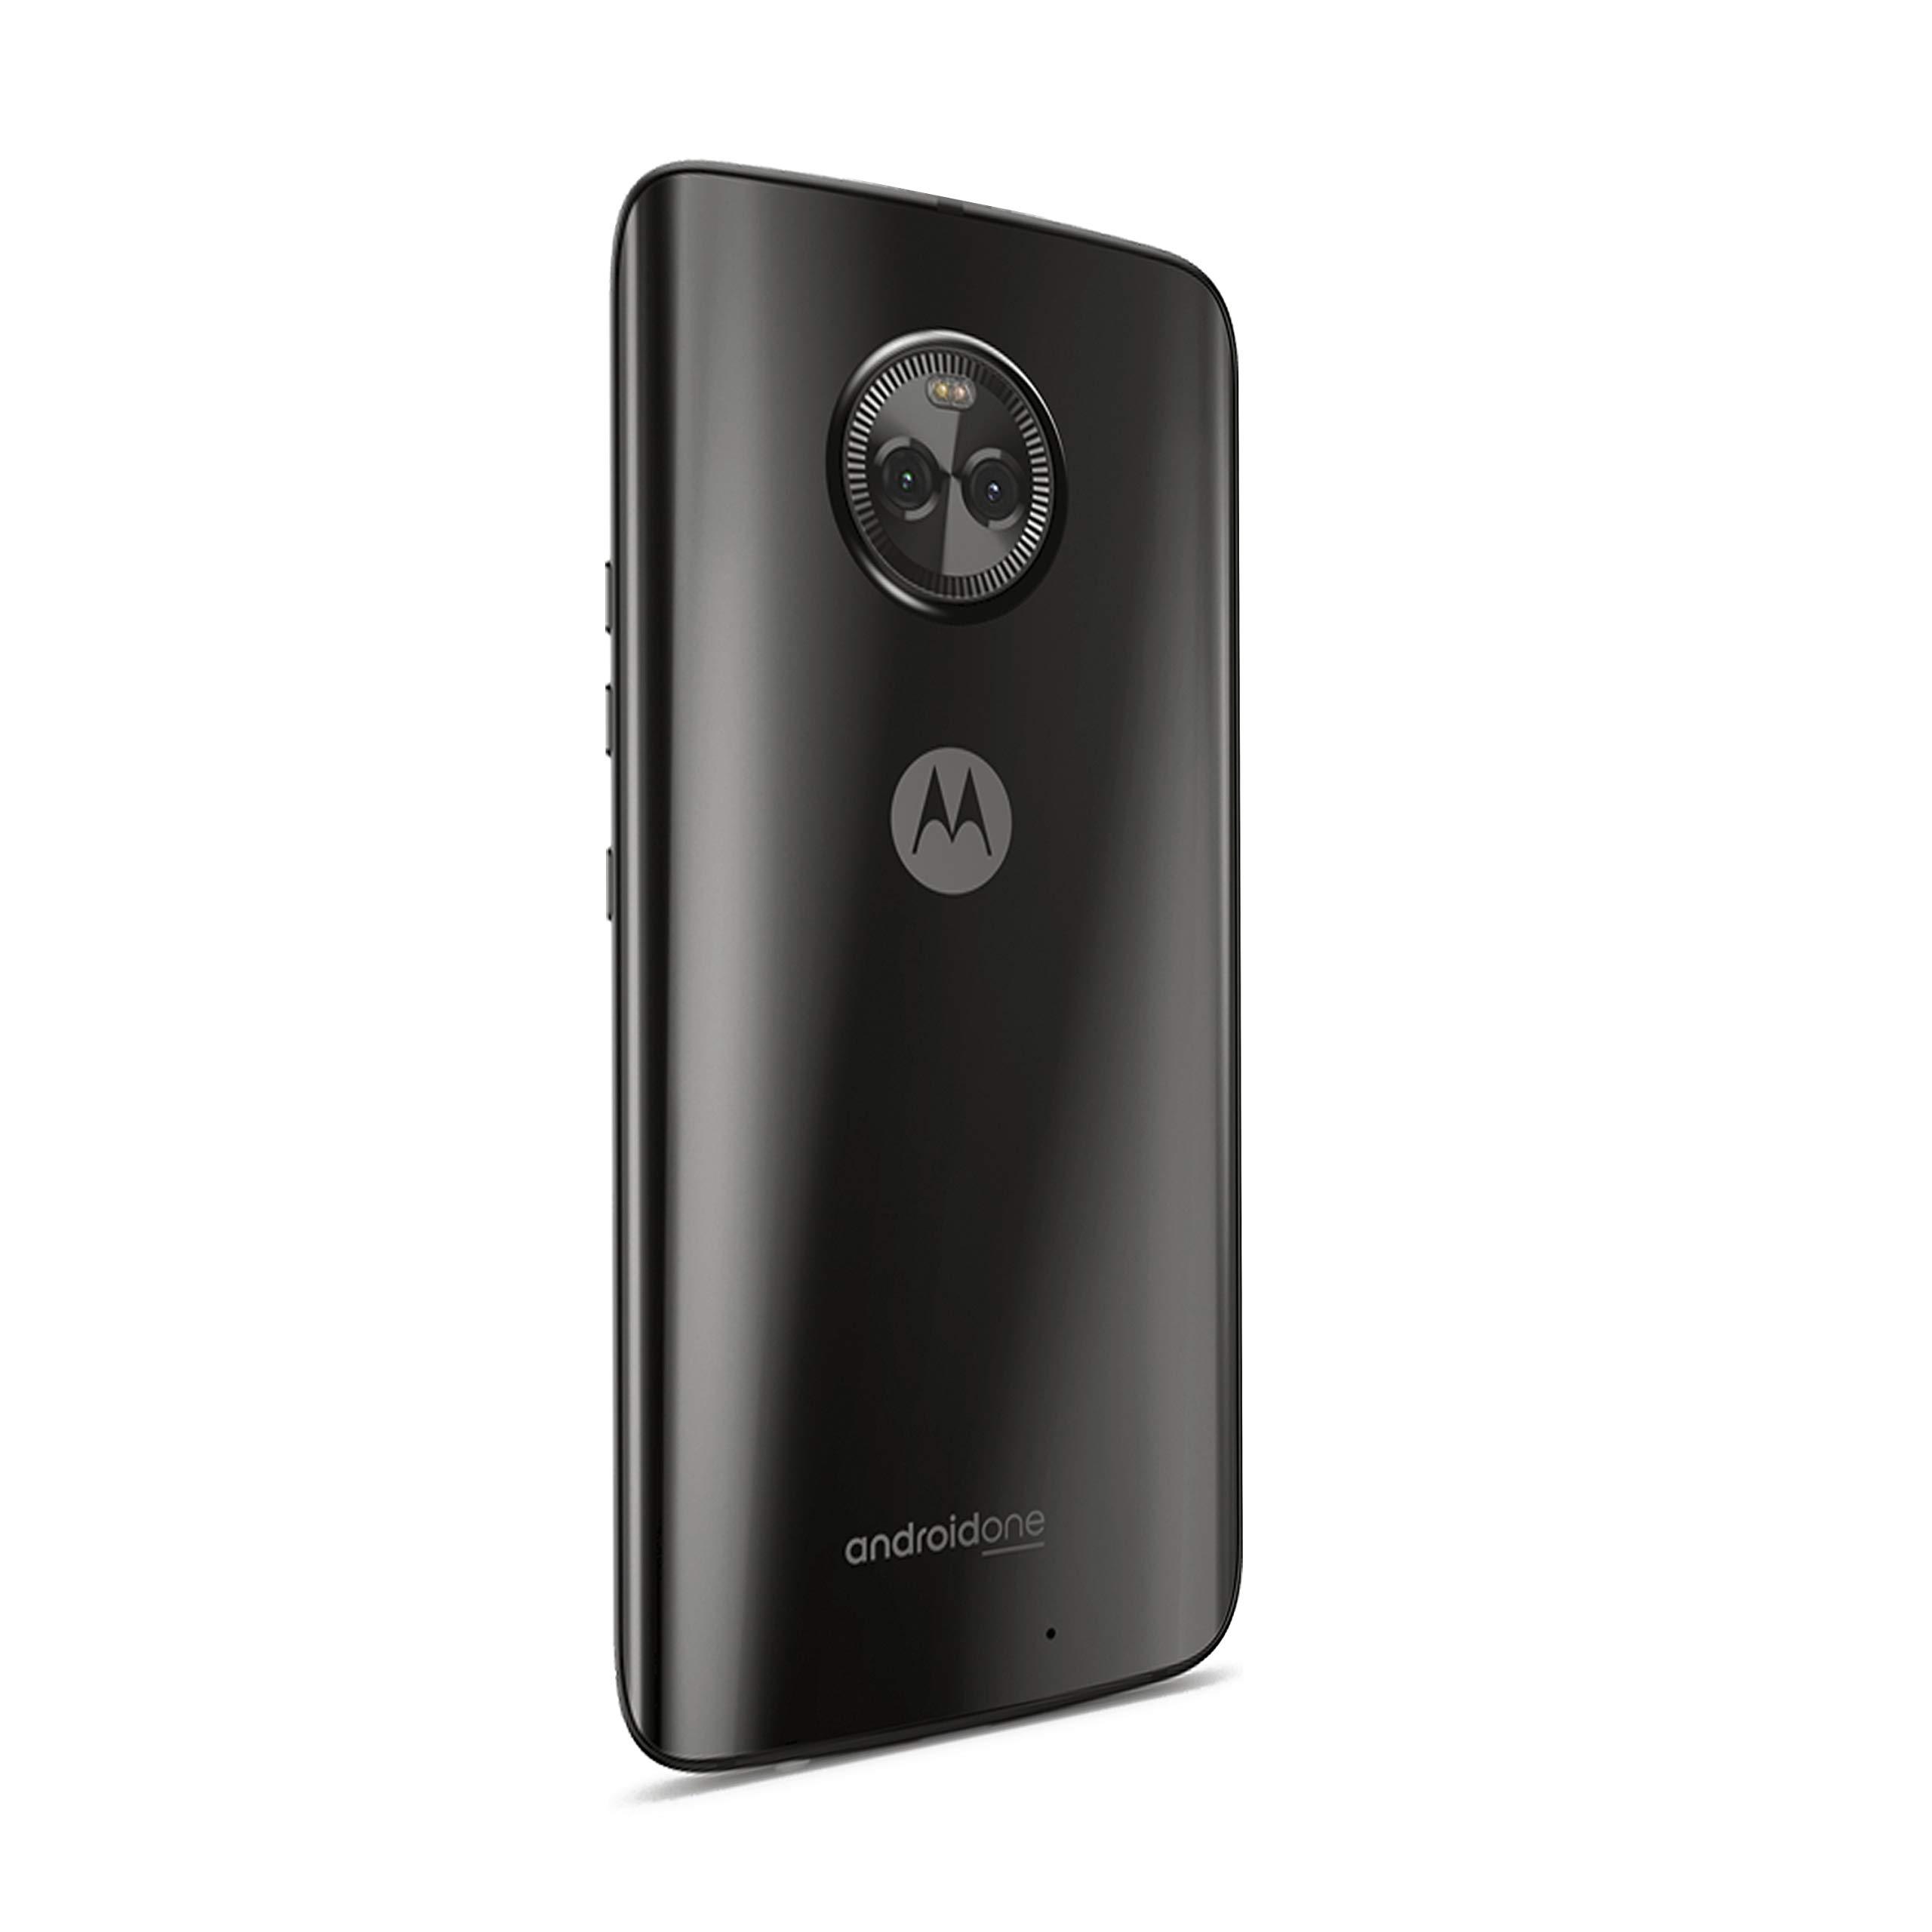 Moto X4 Android One Edition - 64GB - Black - Unlocked by Motorola (Image #4)